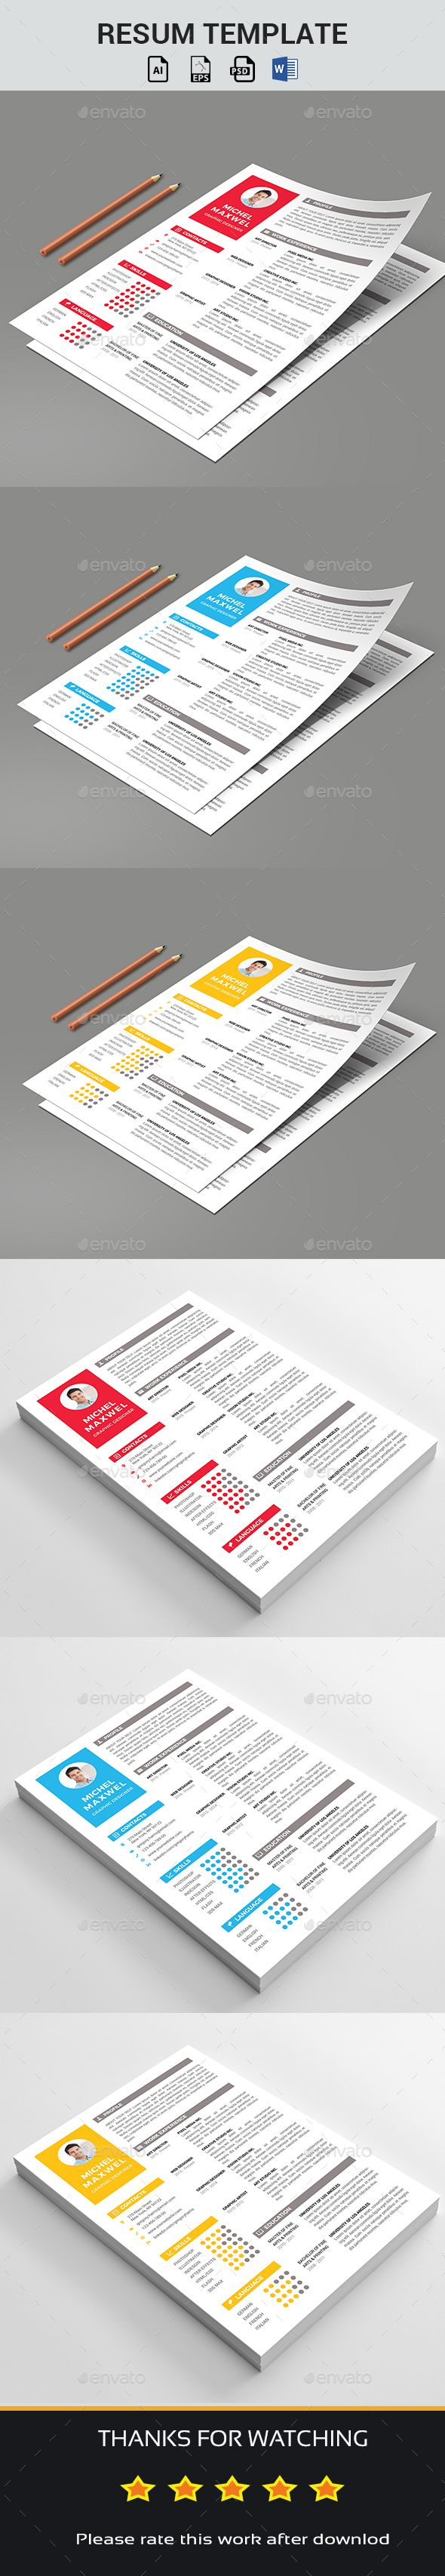 online resume editing